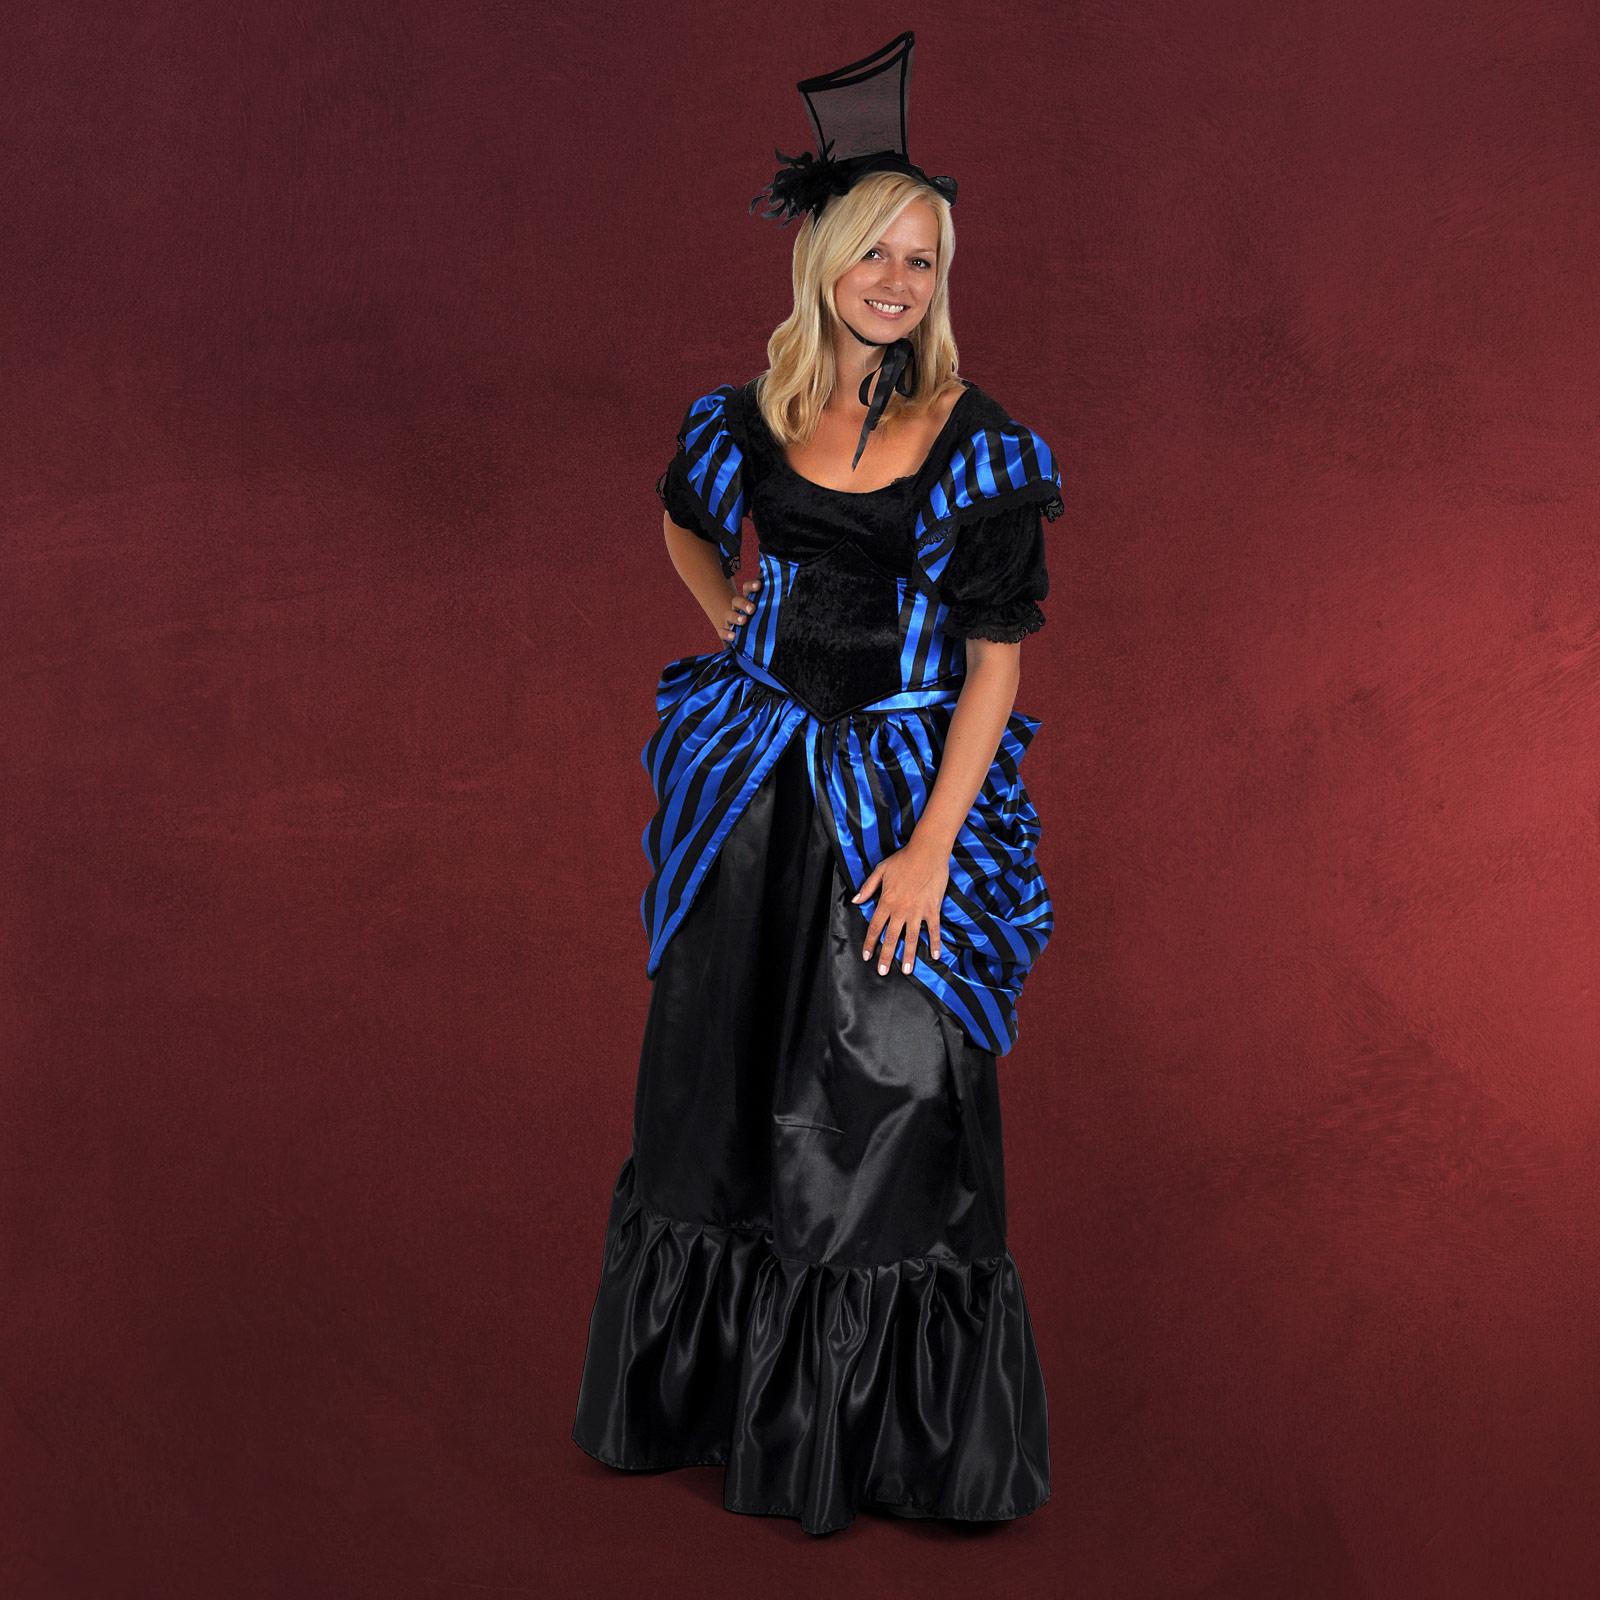 madame lilly historisches kost m kleid damen 4tlg pariser chic f r karneval ebay. Black Bedroom Furniture Sets. Home Design Ideas